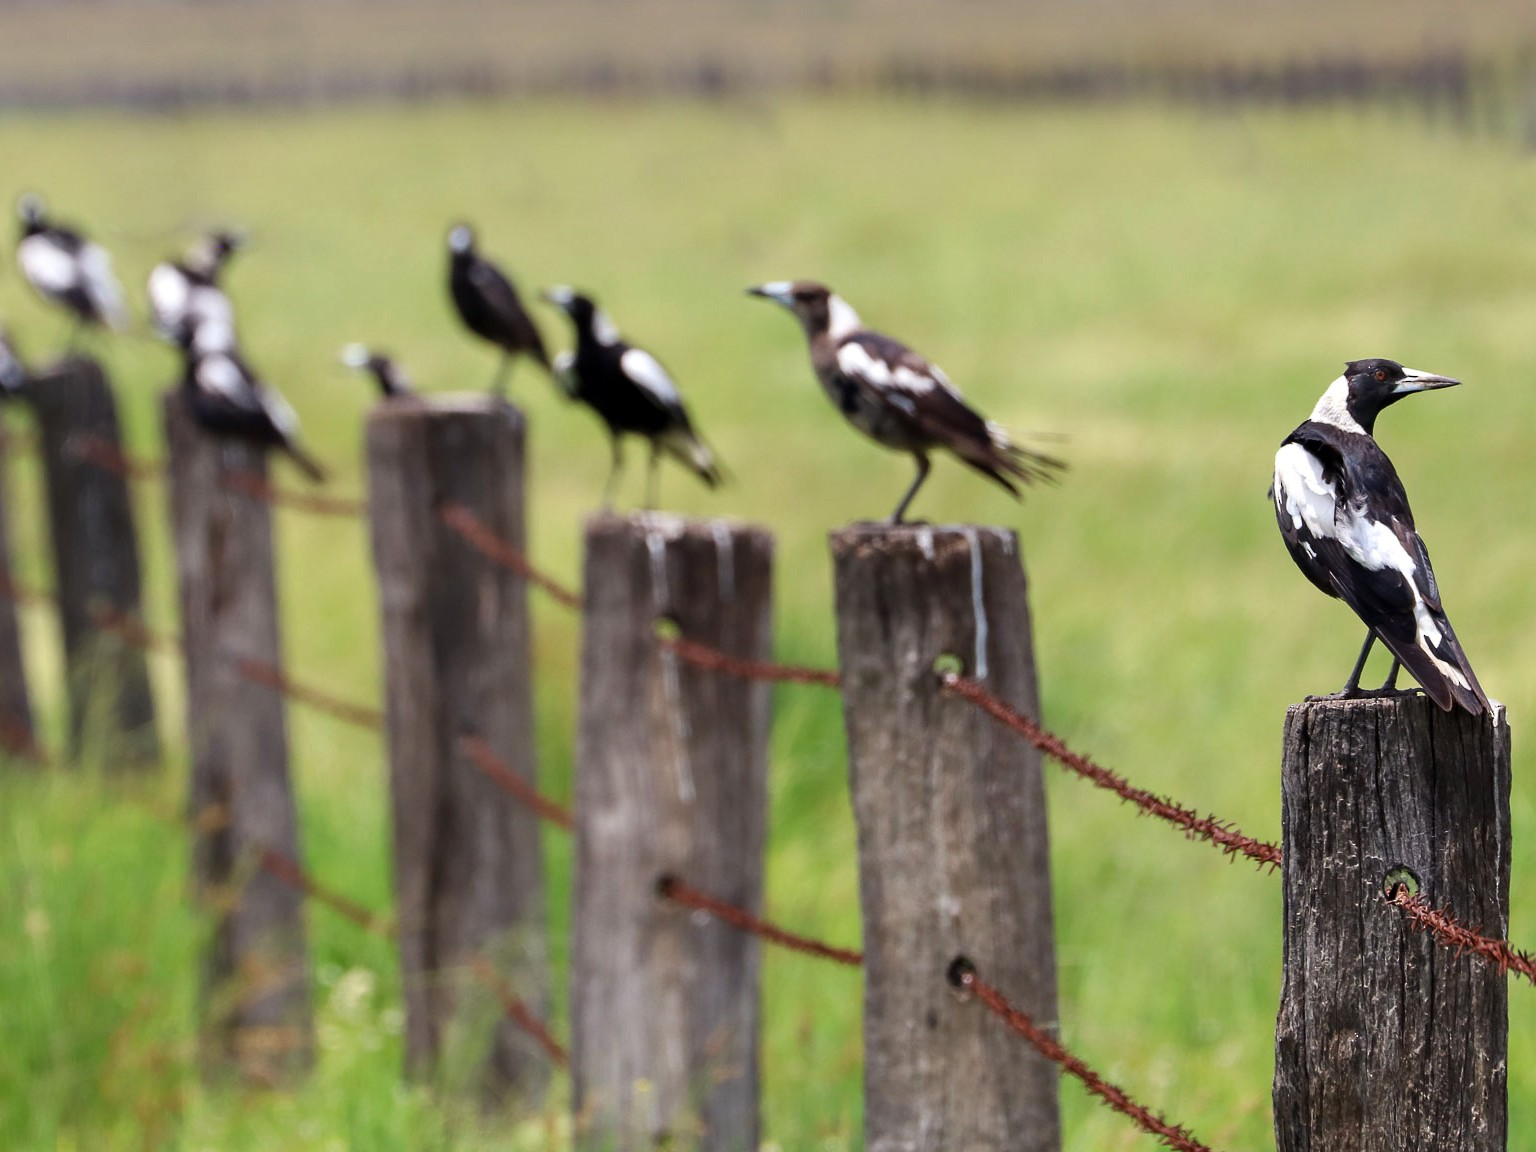 Australian Magpie - Ged Tranter